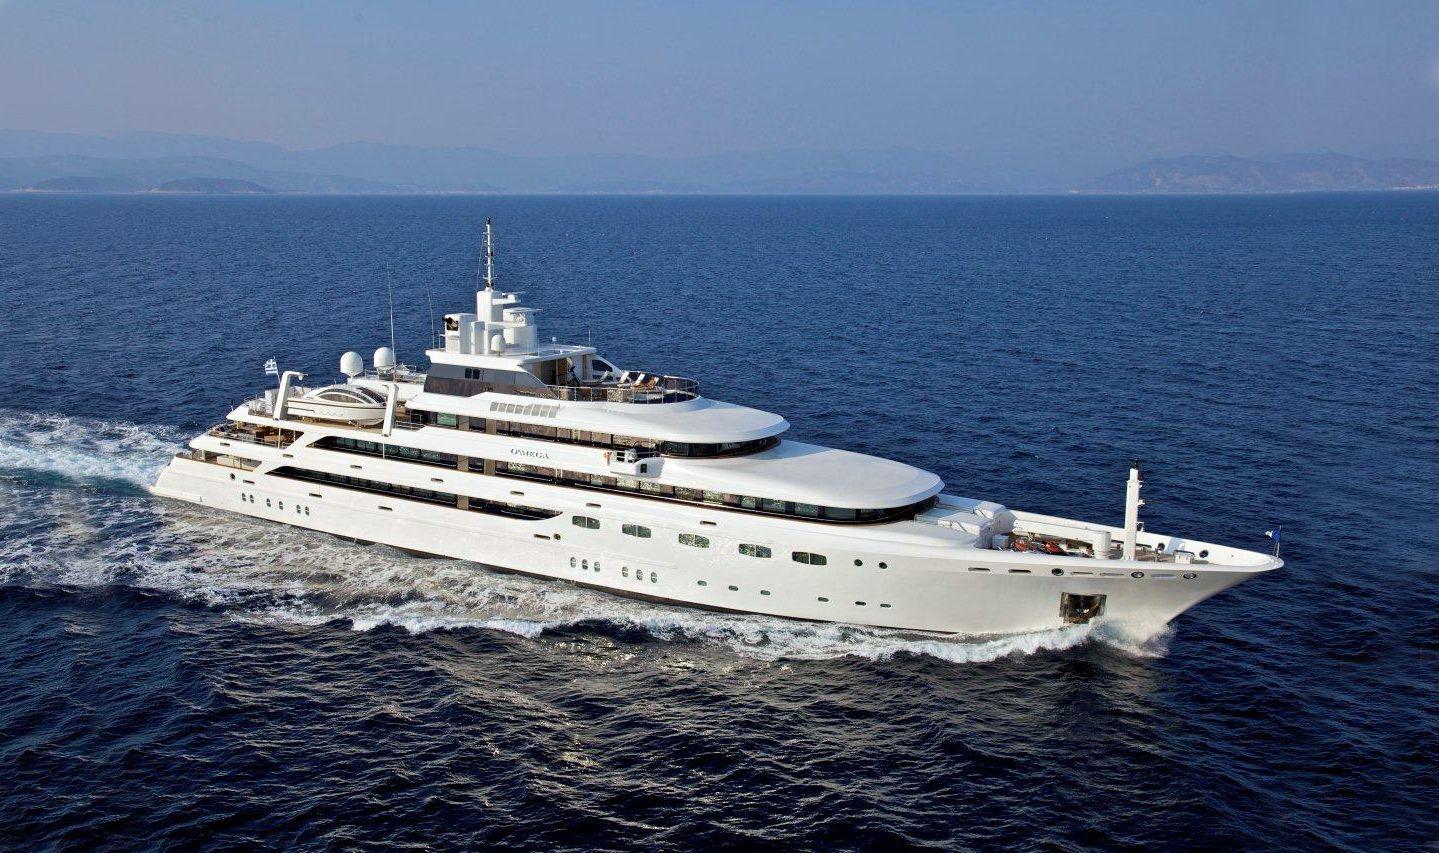 Luxury Motor Yacht For Sale